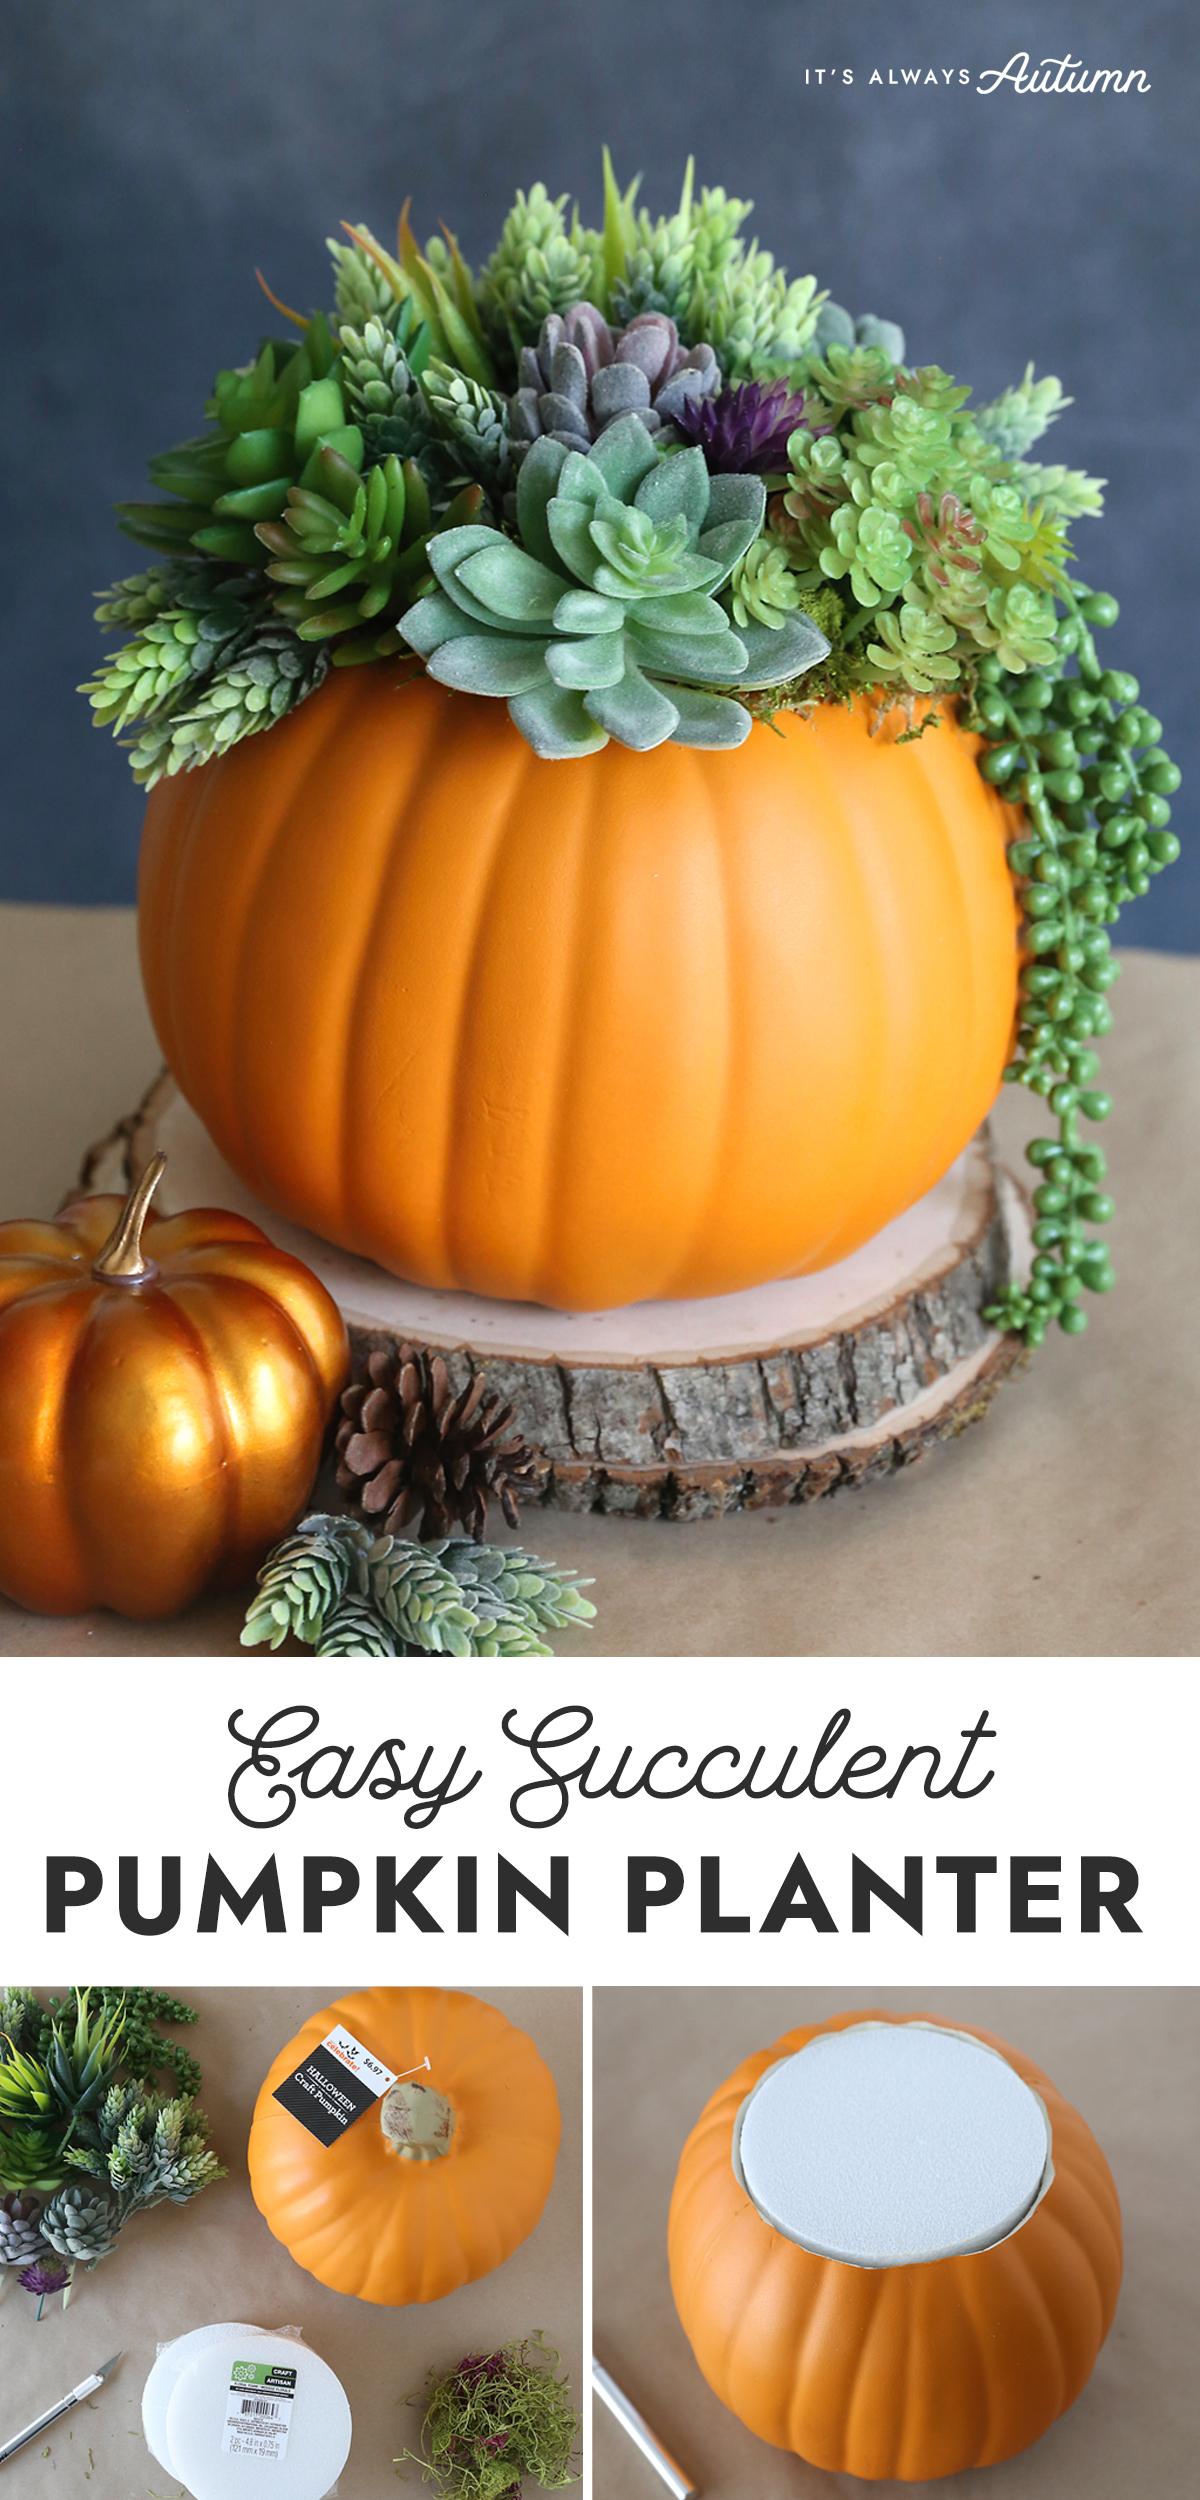 Easy Succulent Pumpkin Planter